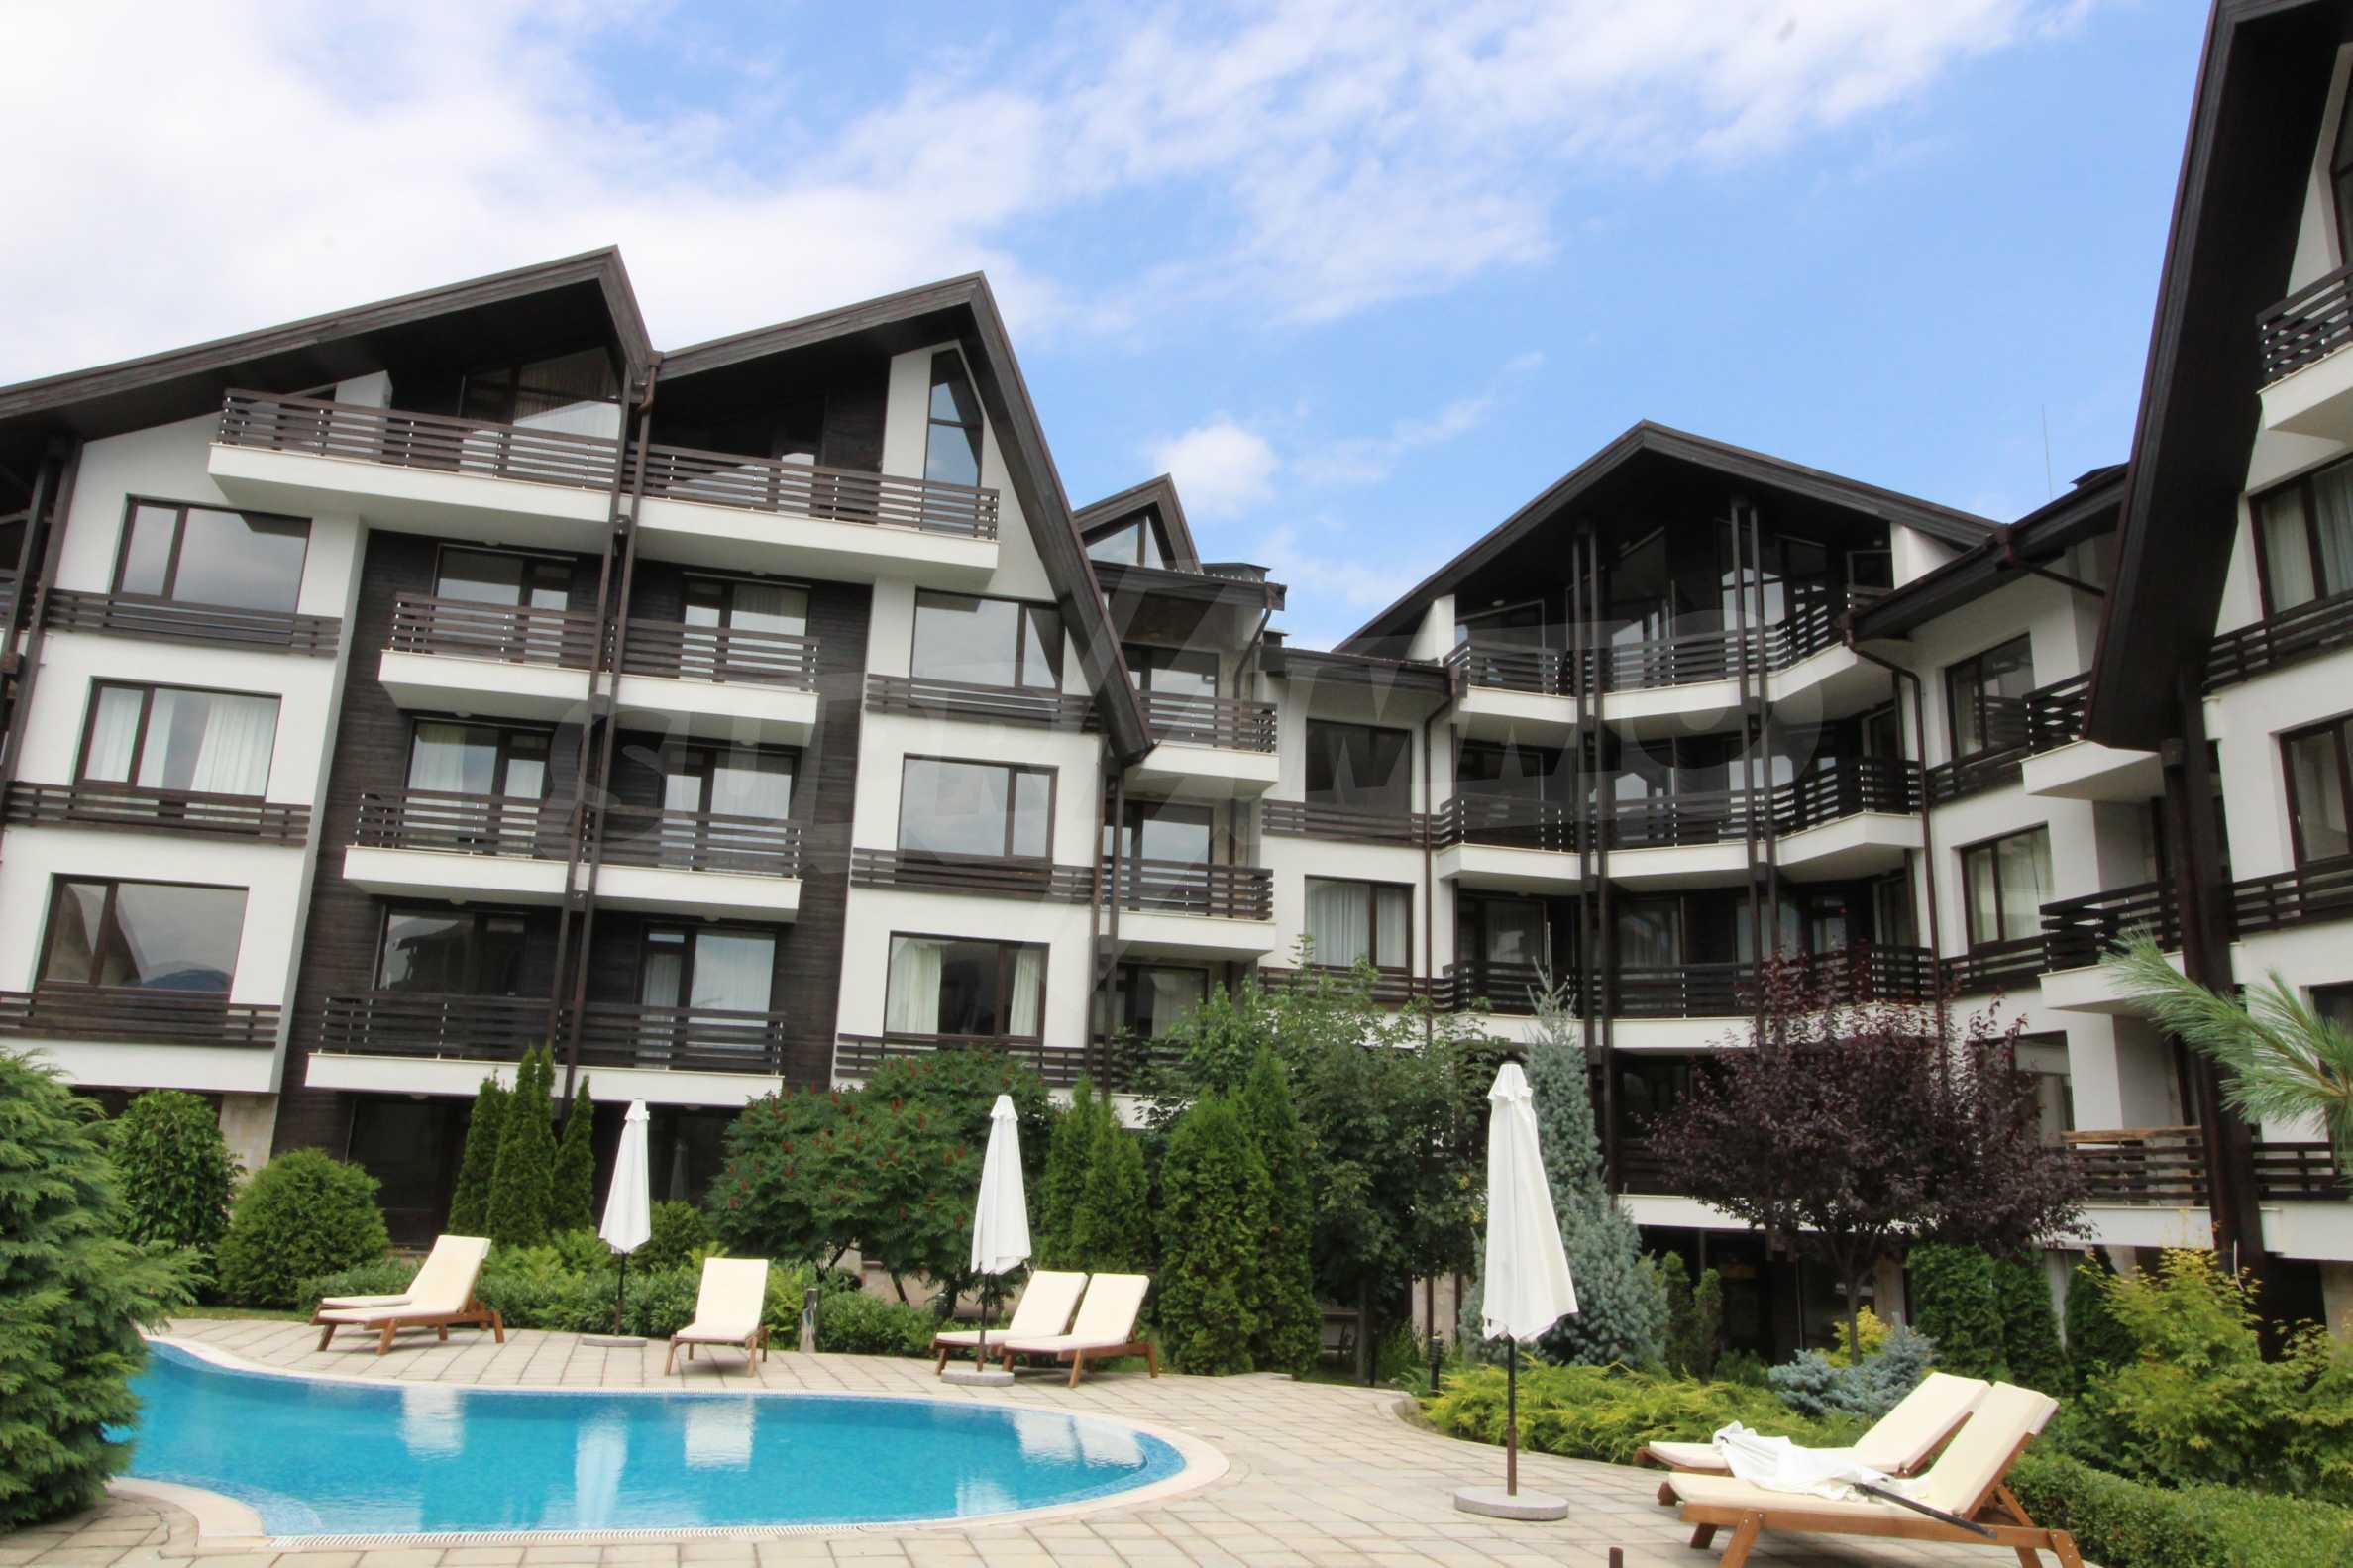 Стилен апартамент в близост до ски курорта Банско